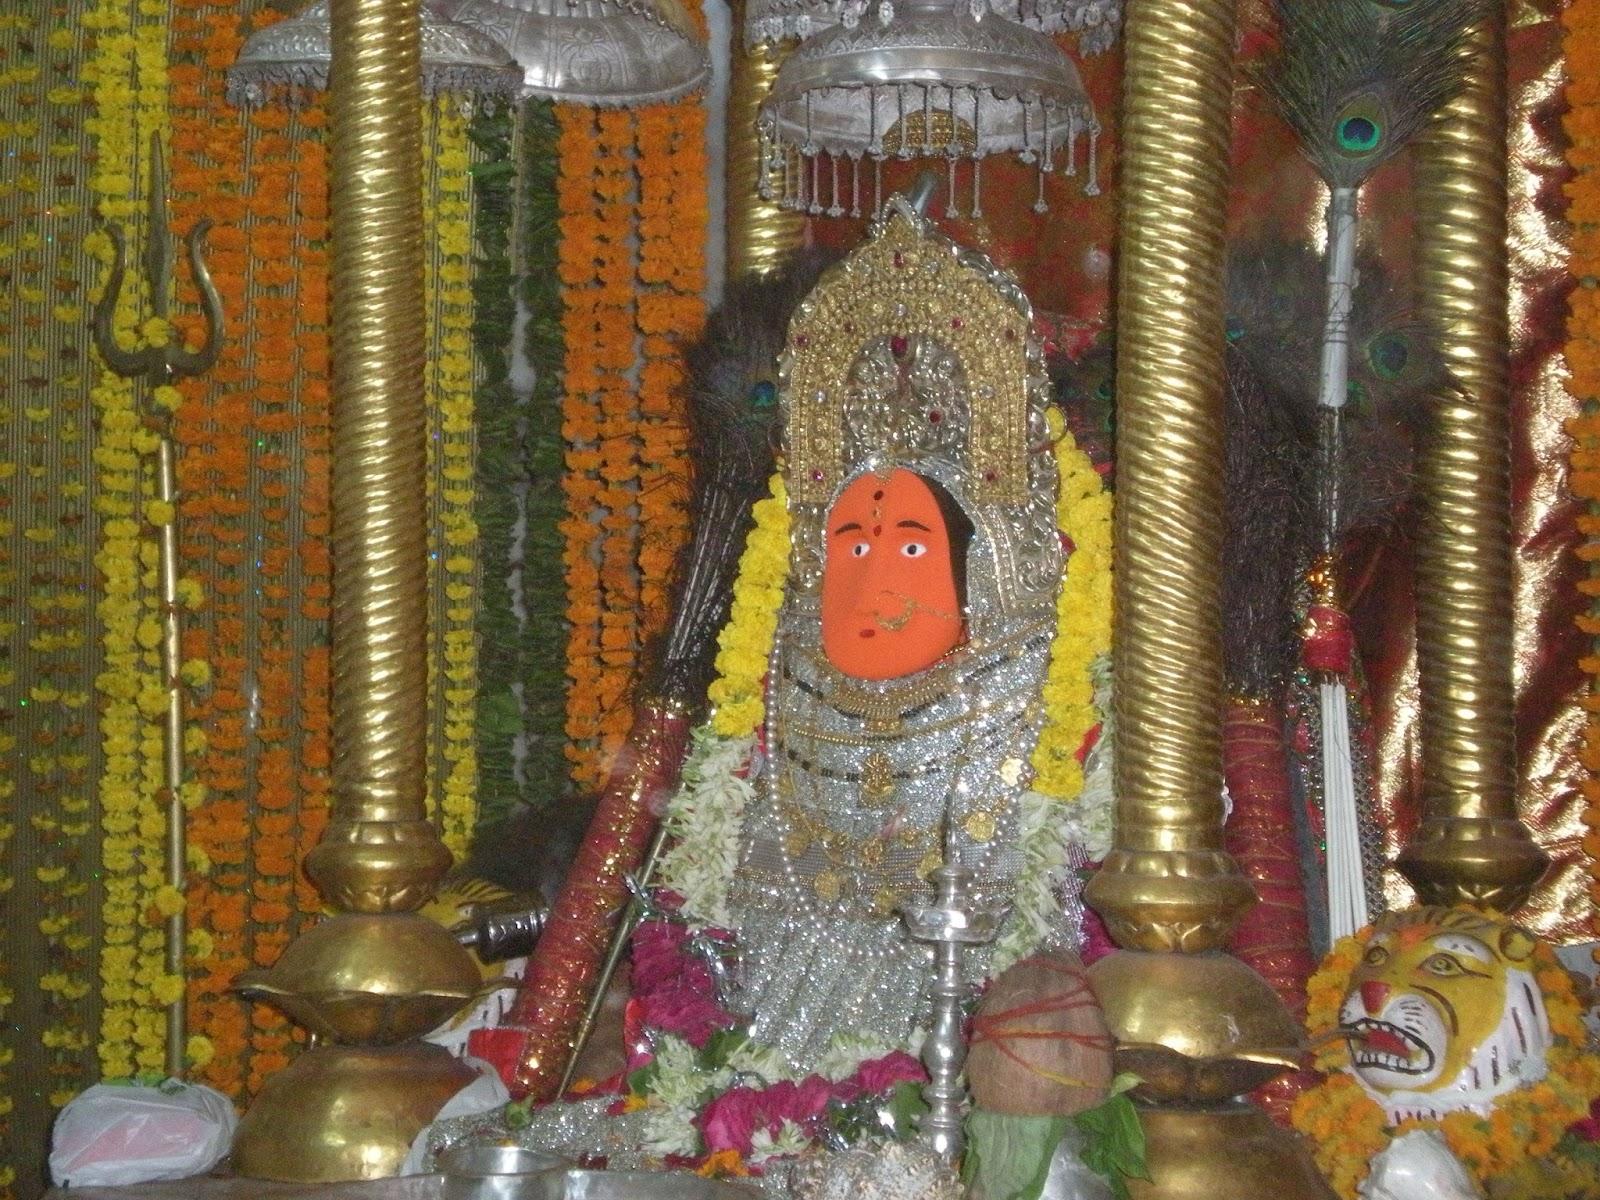 Bamleshwari Mai Dongargarh, shakti pith, jai mata di, durga maa,